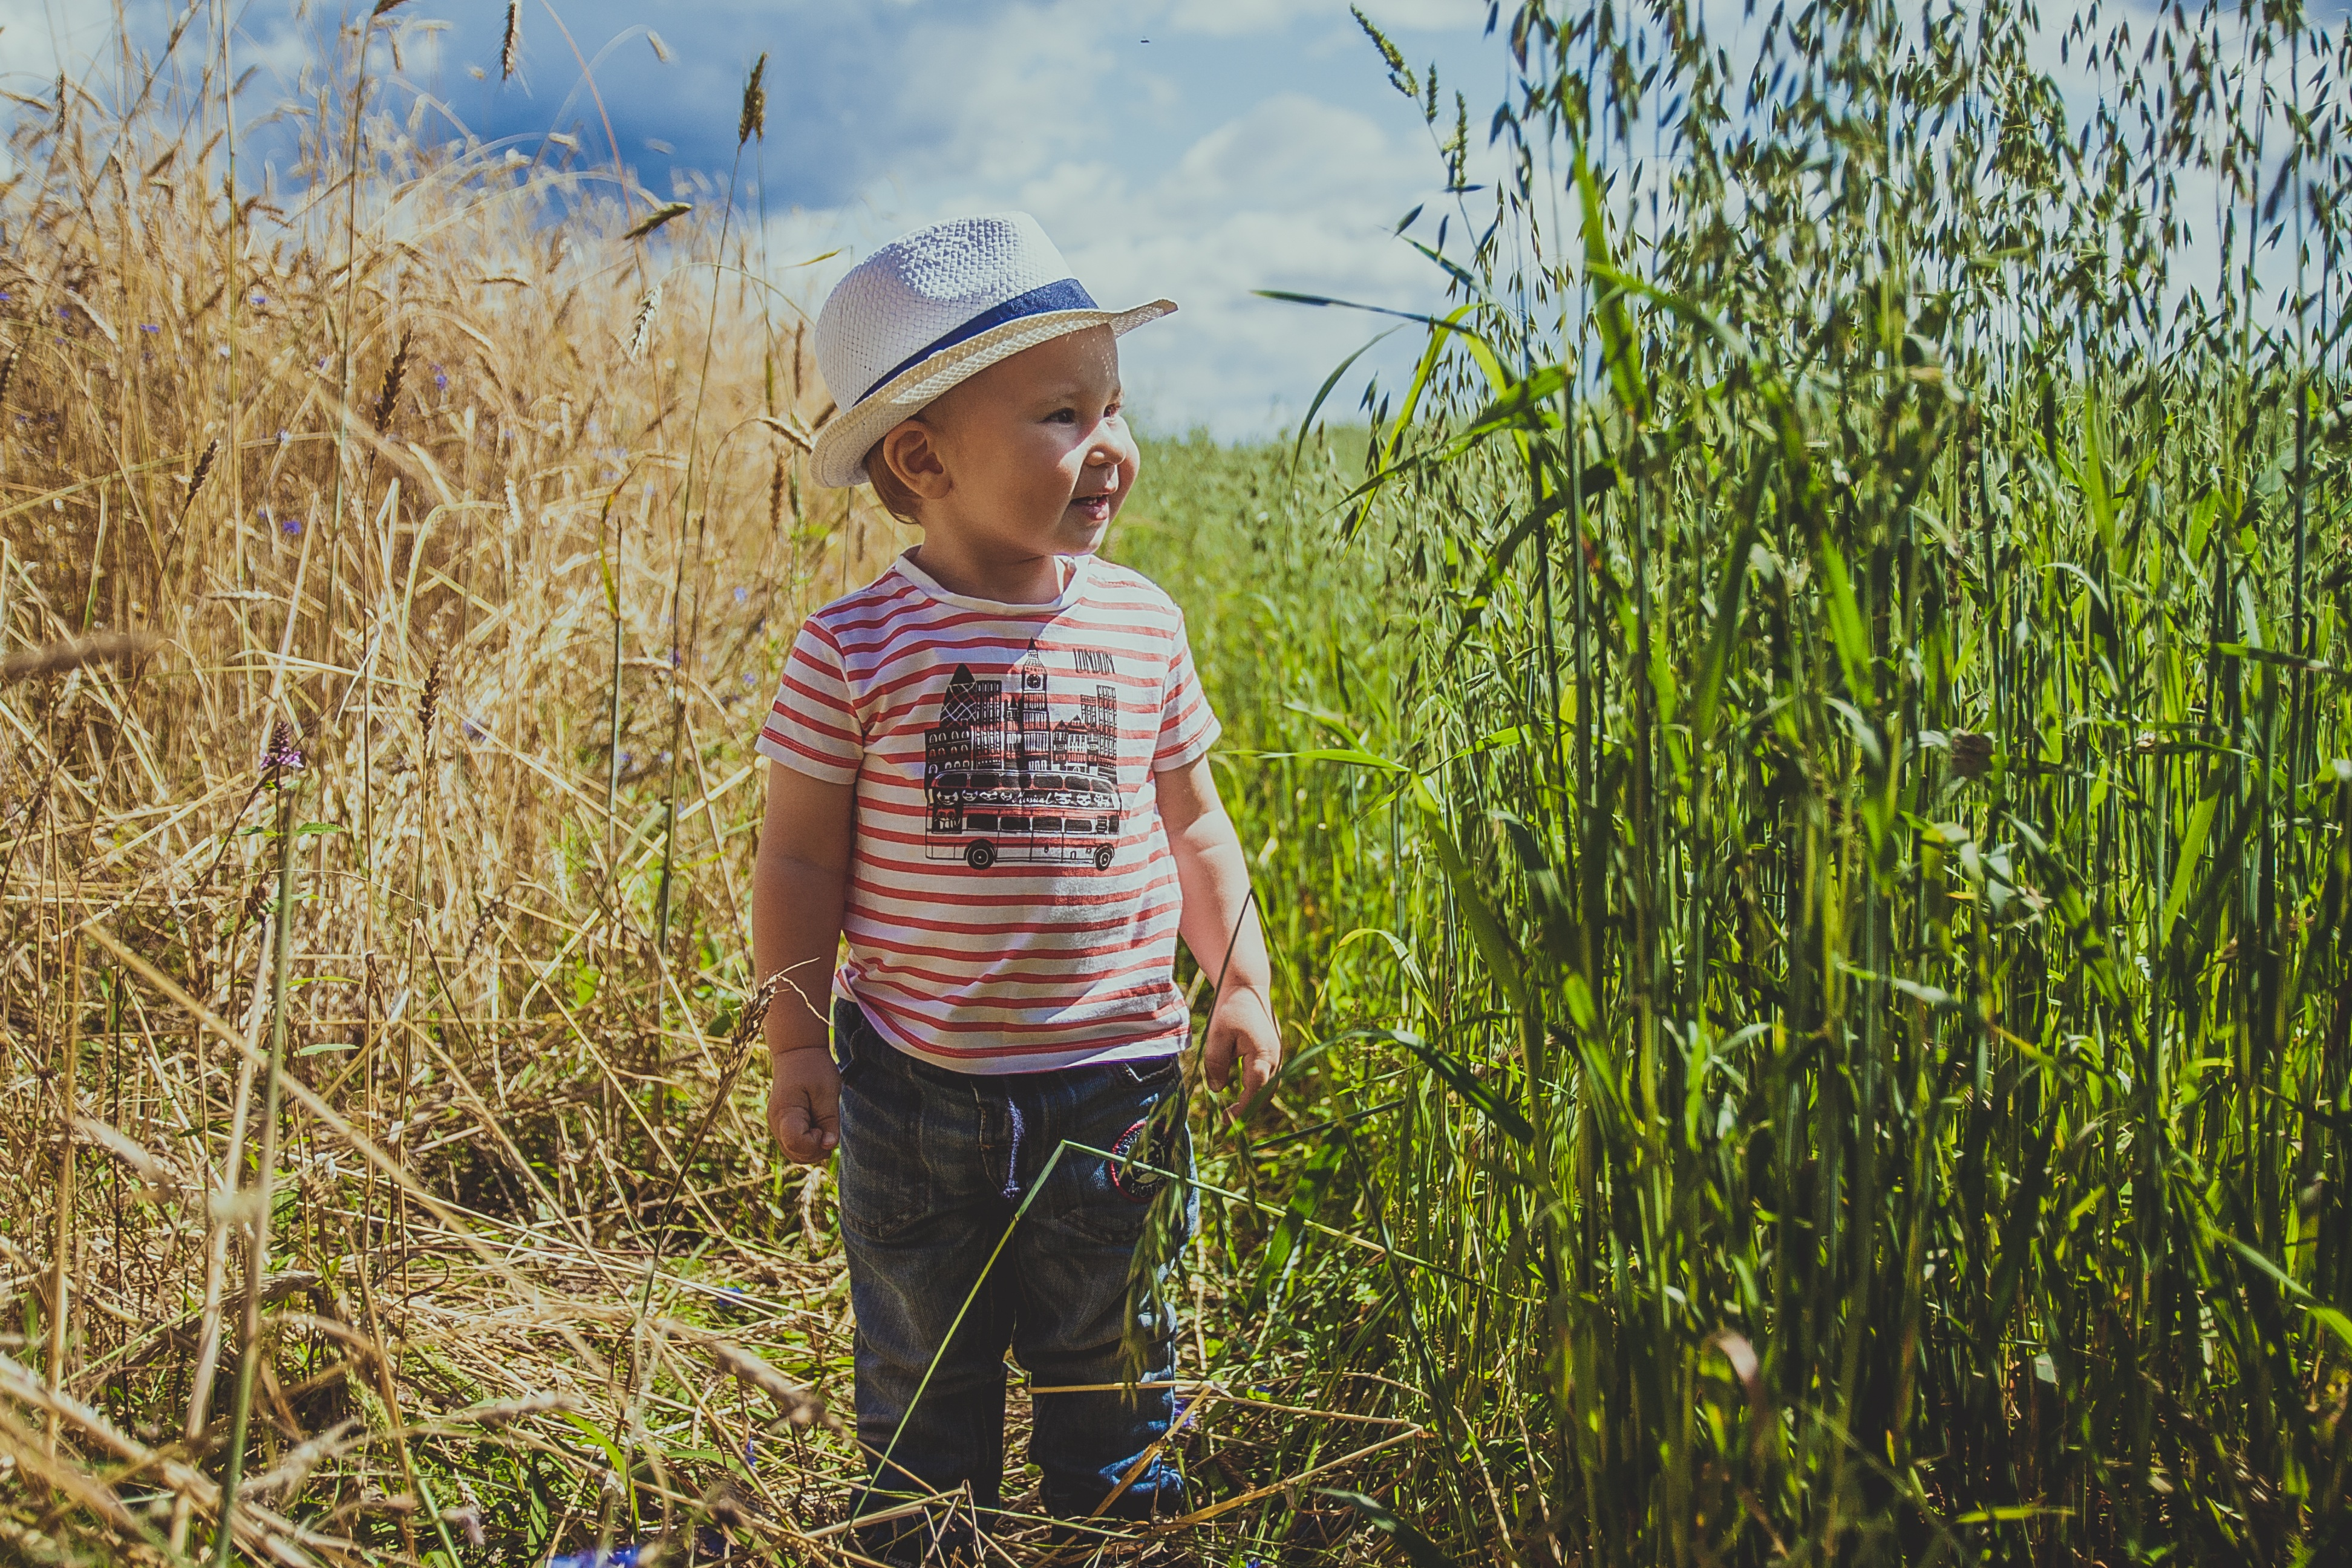 Enriching, alternative travel with kids